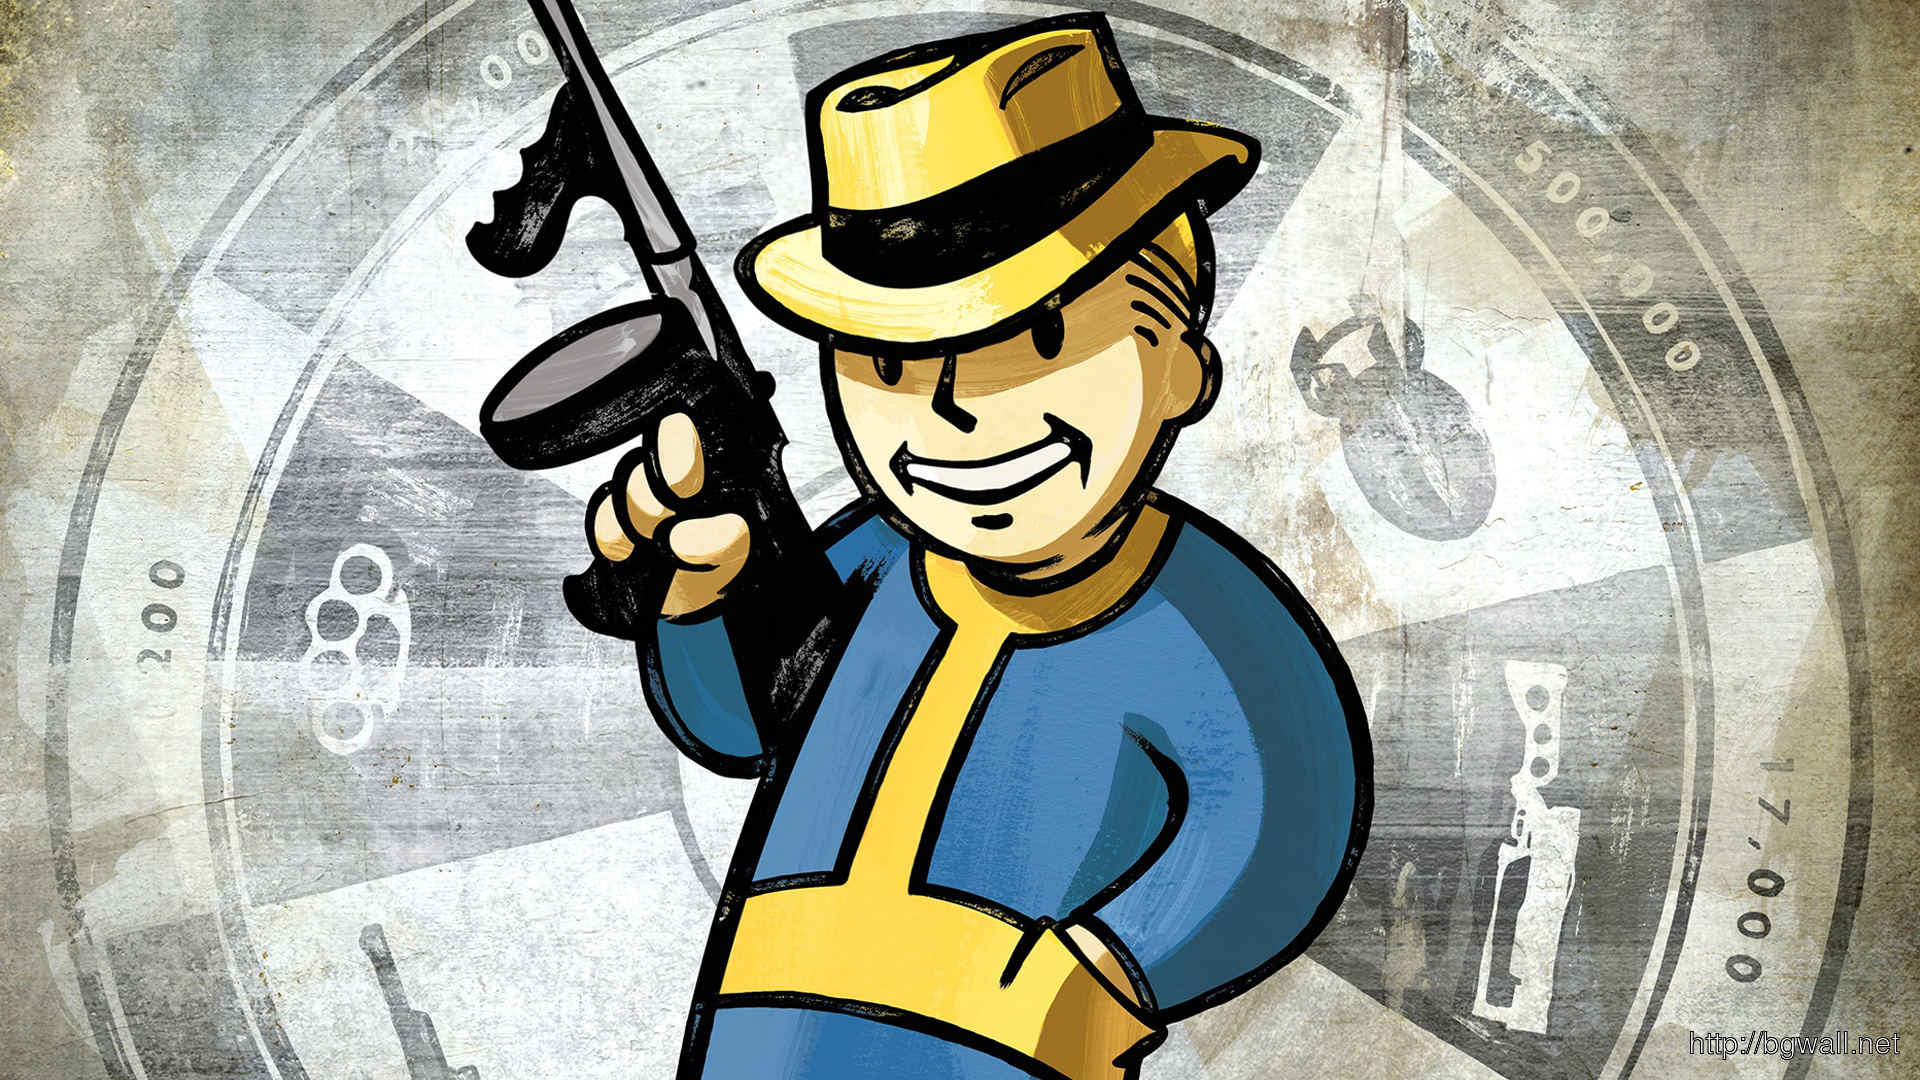 Fallout New Vegas Vault Boy Full Size